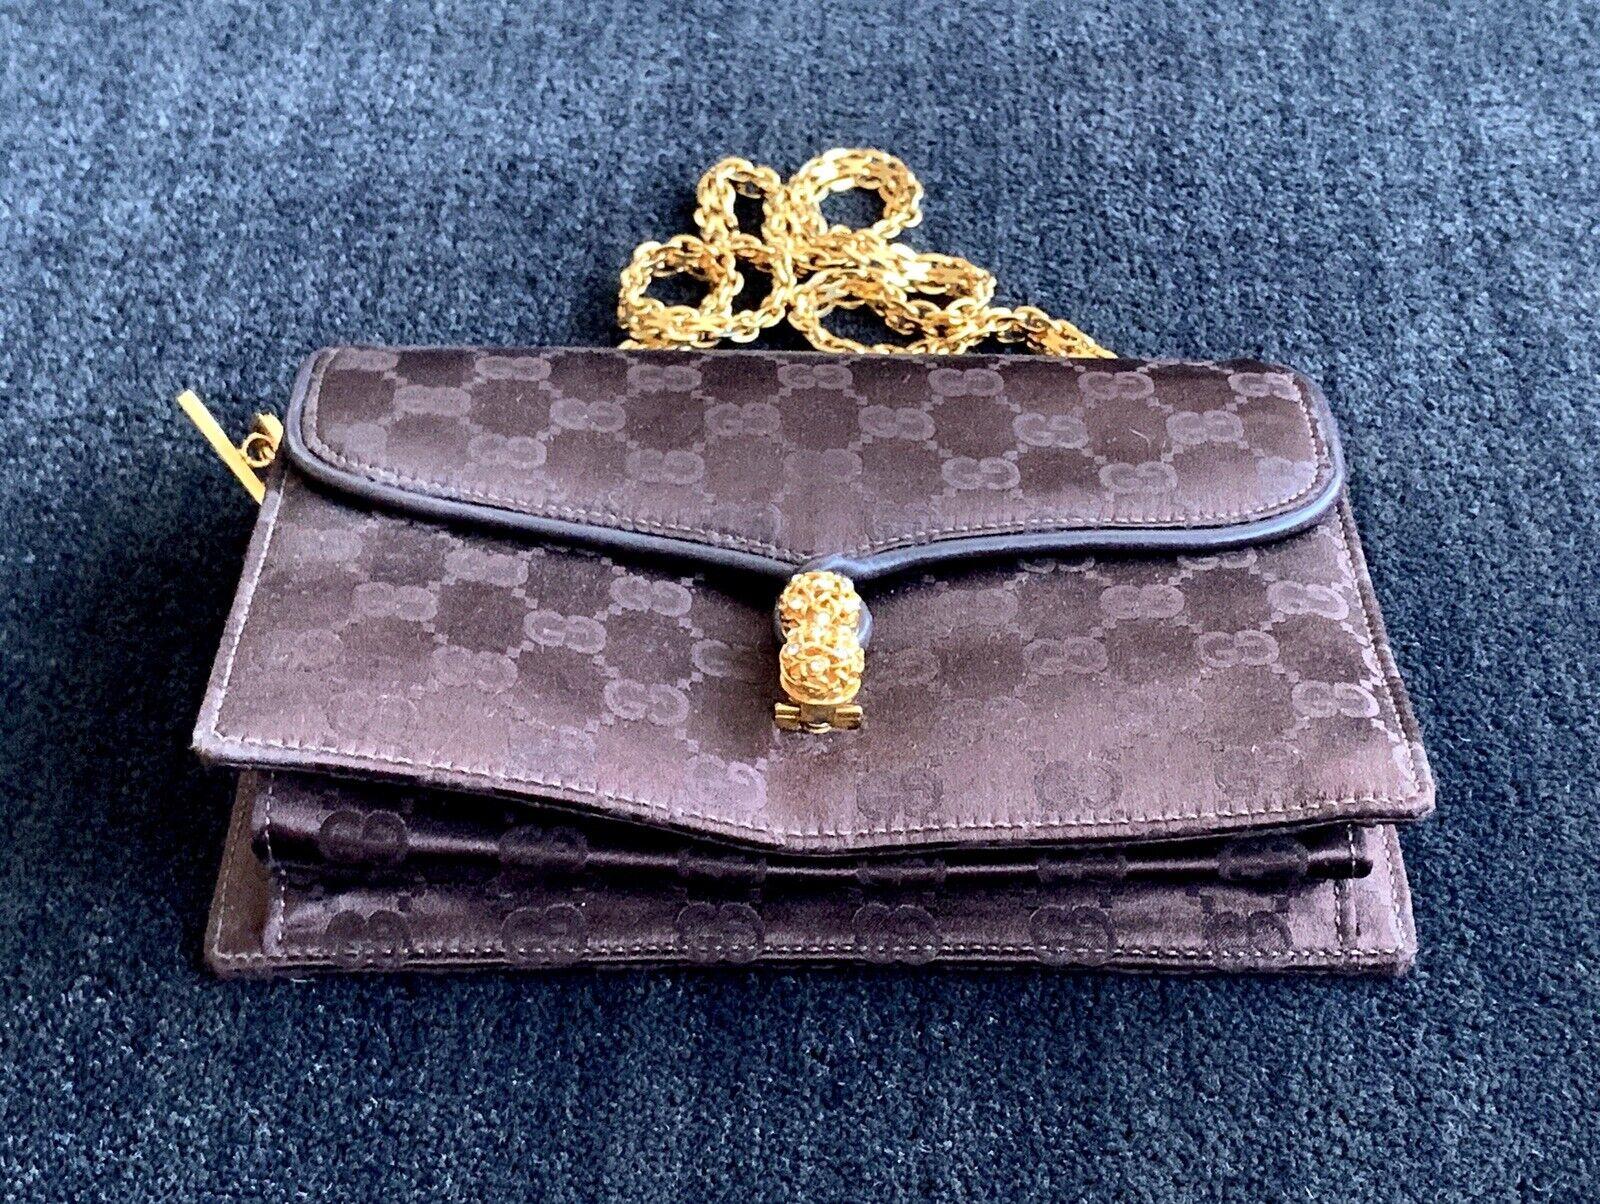 Gucci Vintage Classic Handbag with original box  - image 9